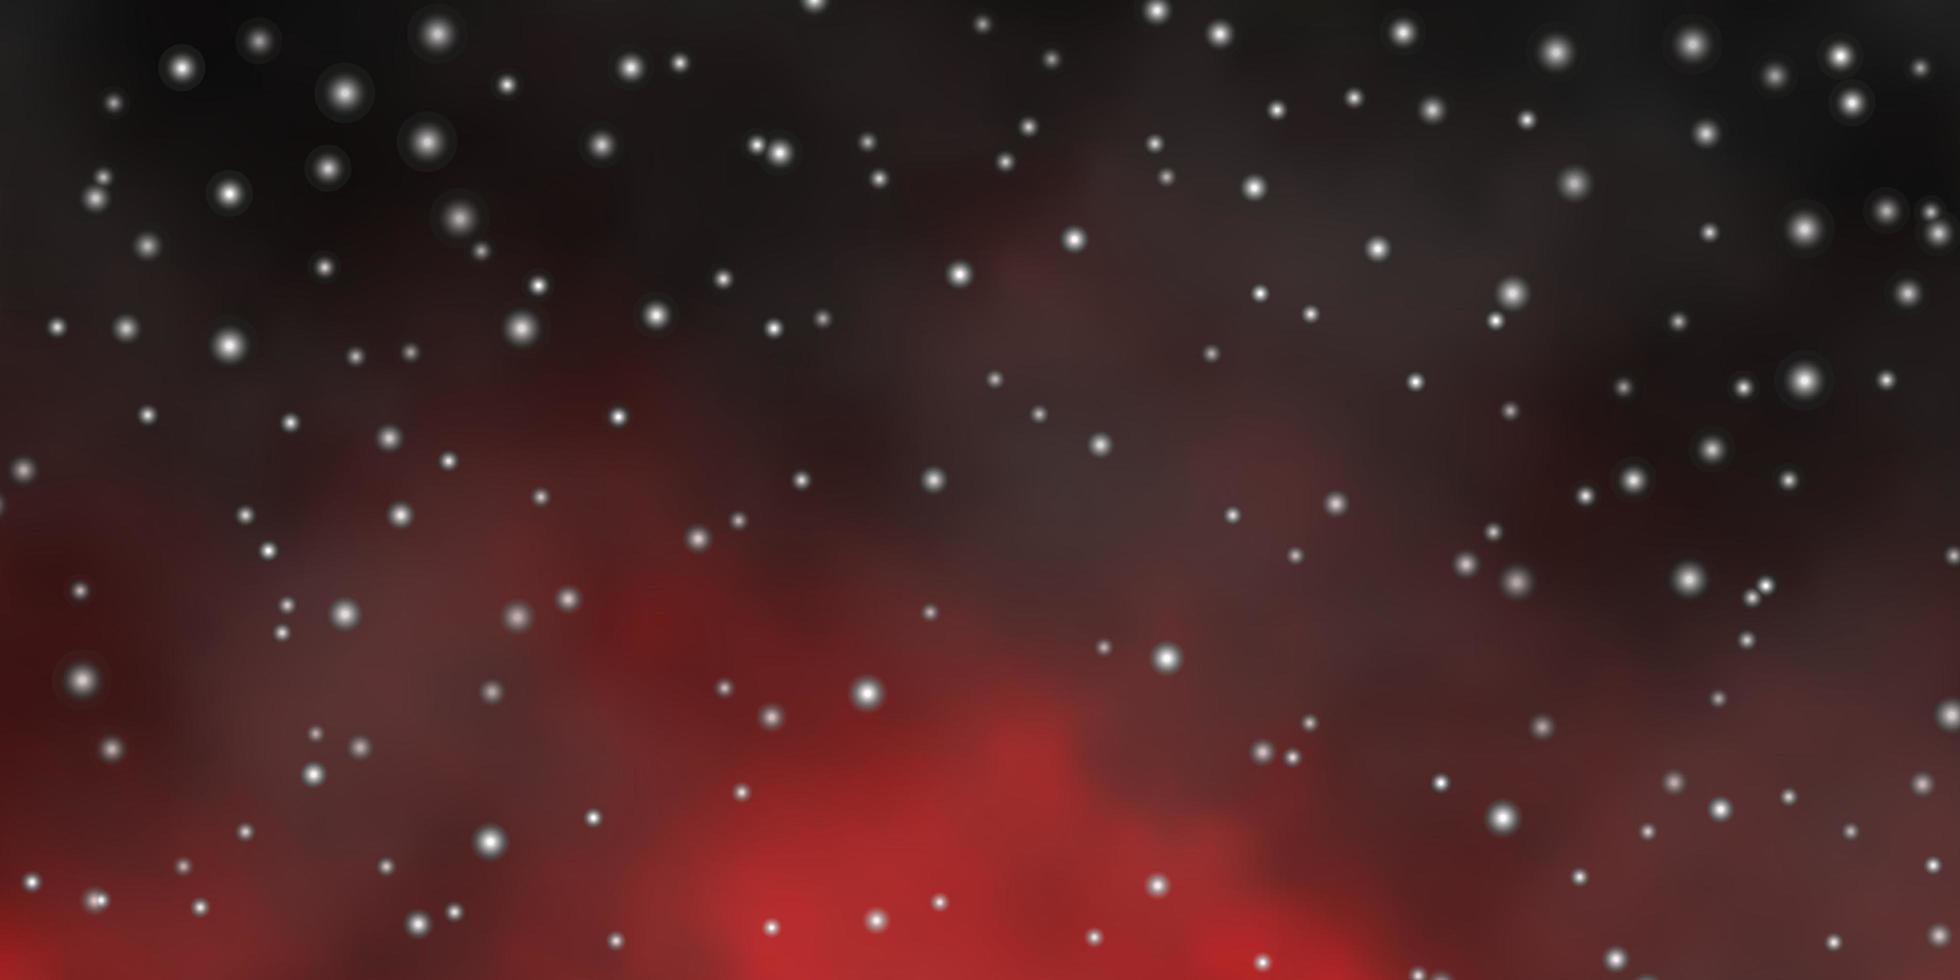 Dark Brown layout with bright stars. vector